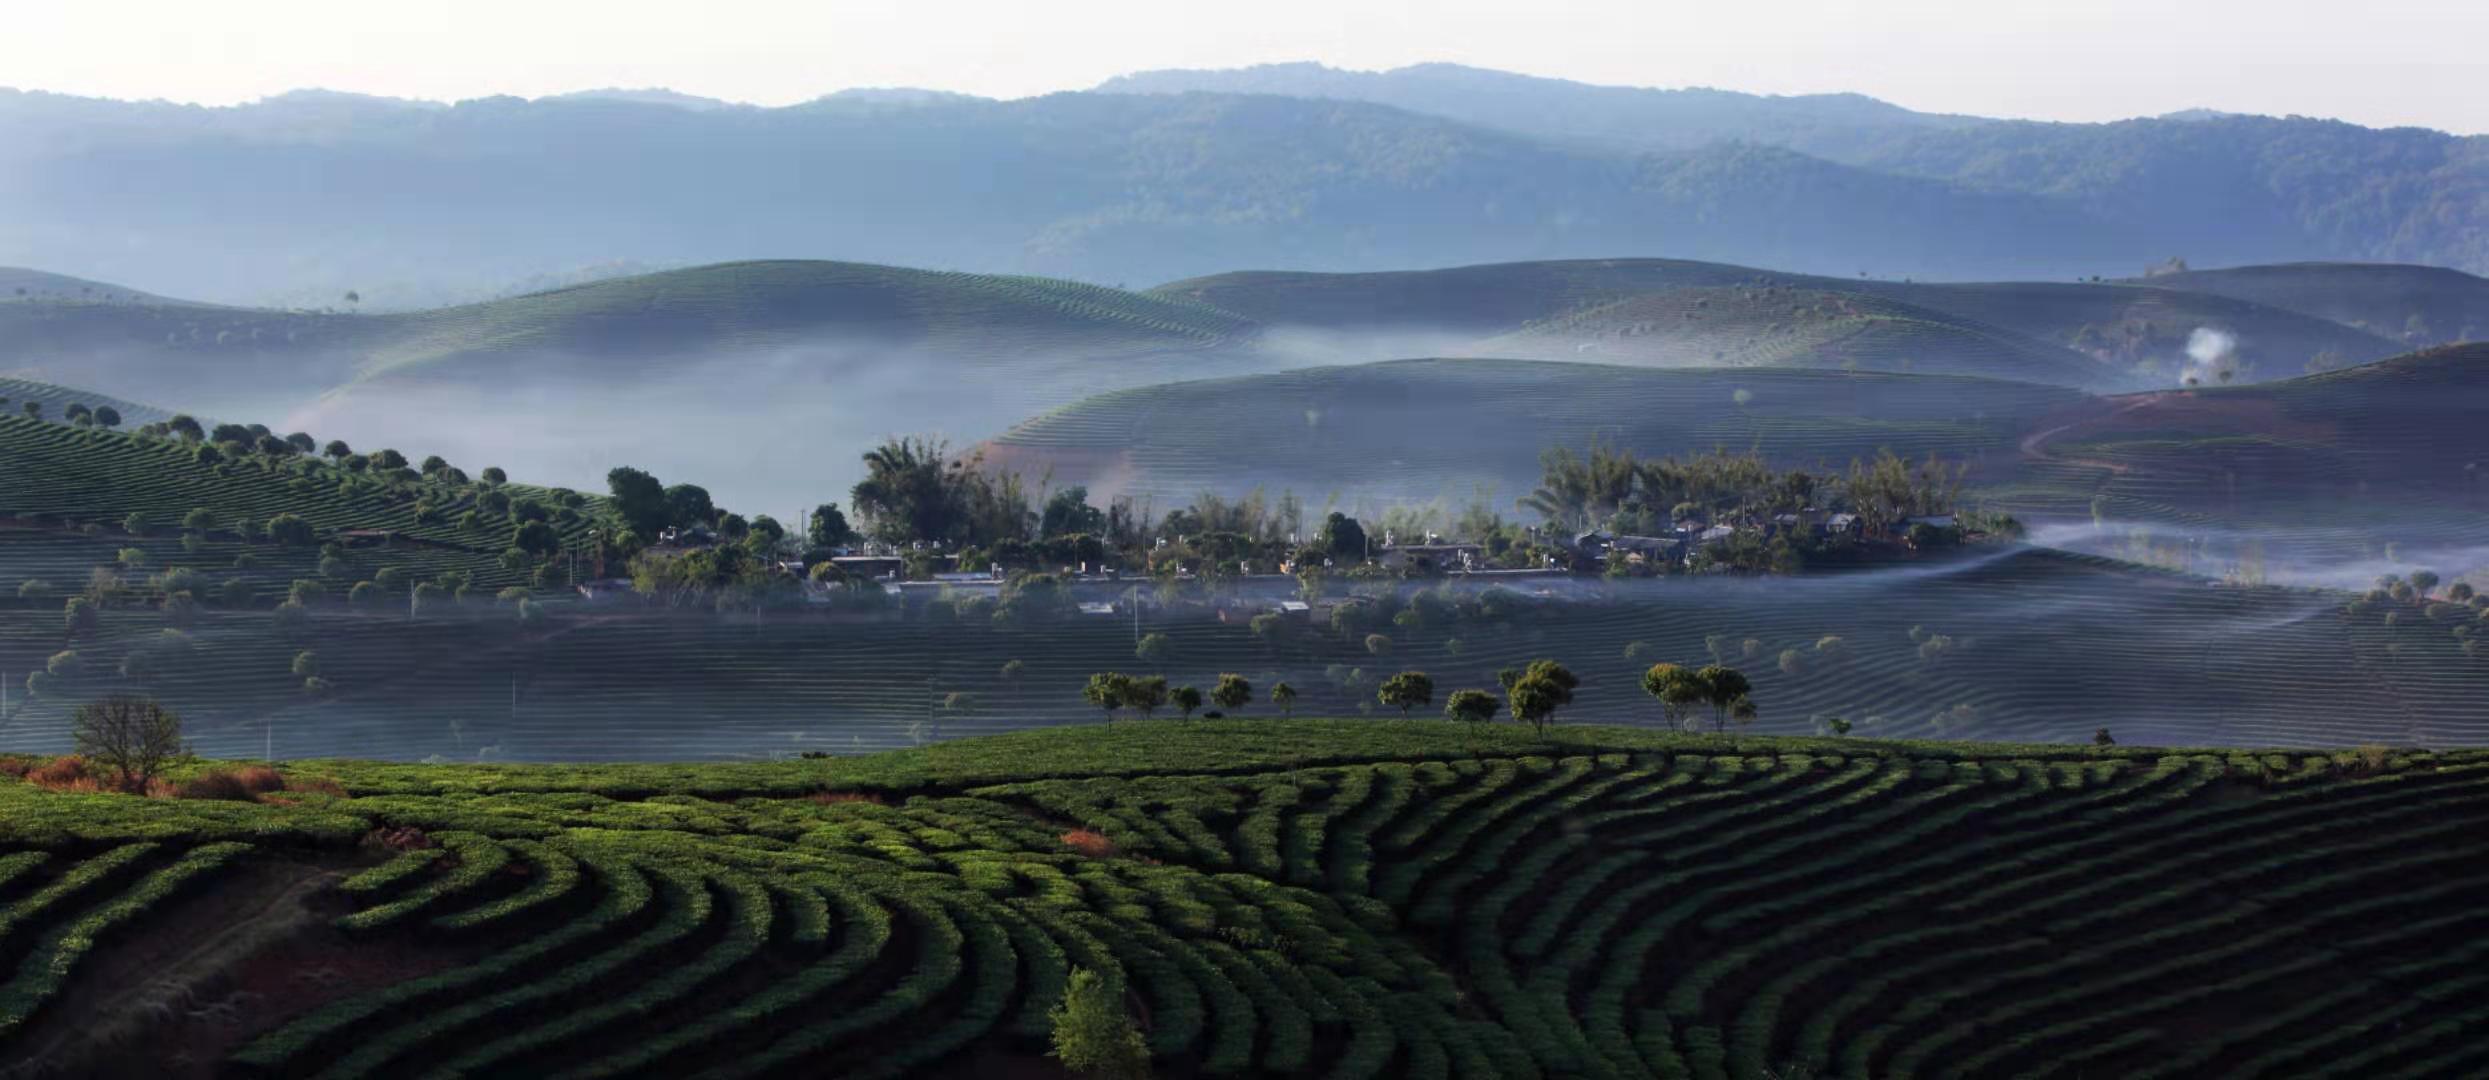 Dadugang recognized as world's largest tea plantation  - Xinhua | English.news.cn